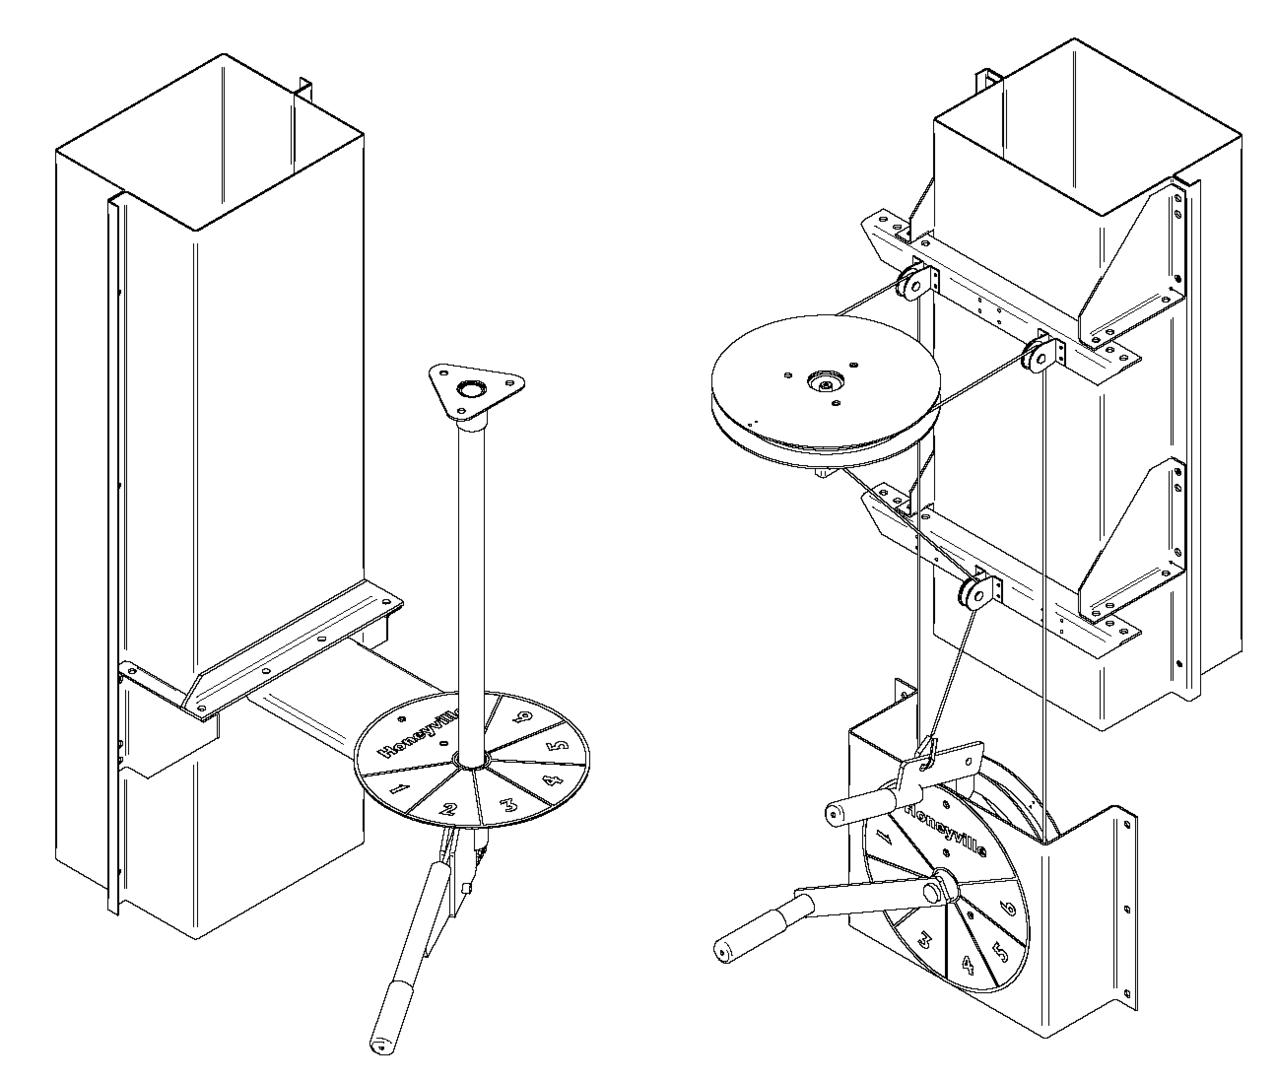 grain kernel diagram 7 pin trailer plug wiring flat leg experts